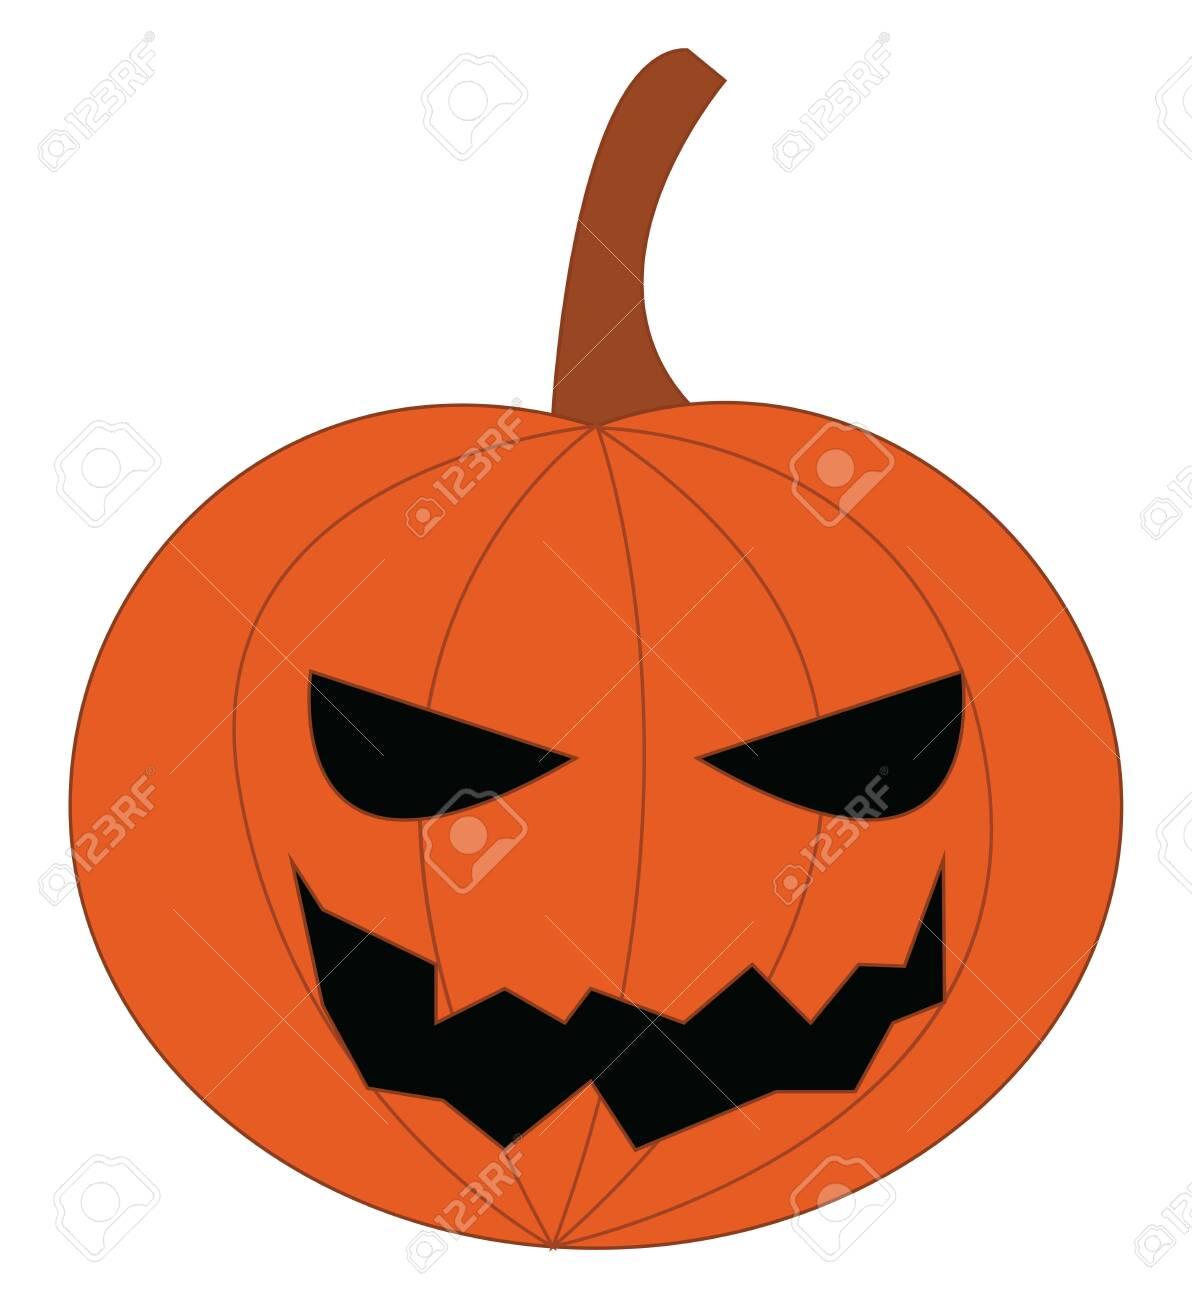 Jack O Lantern Halloween Decoration Craved From Pumpkin Vector